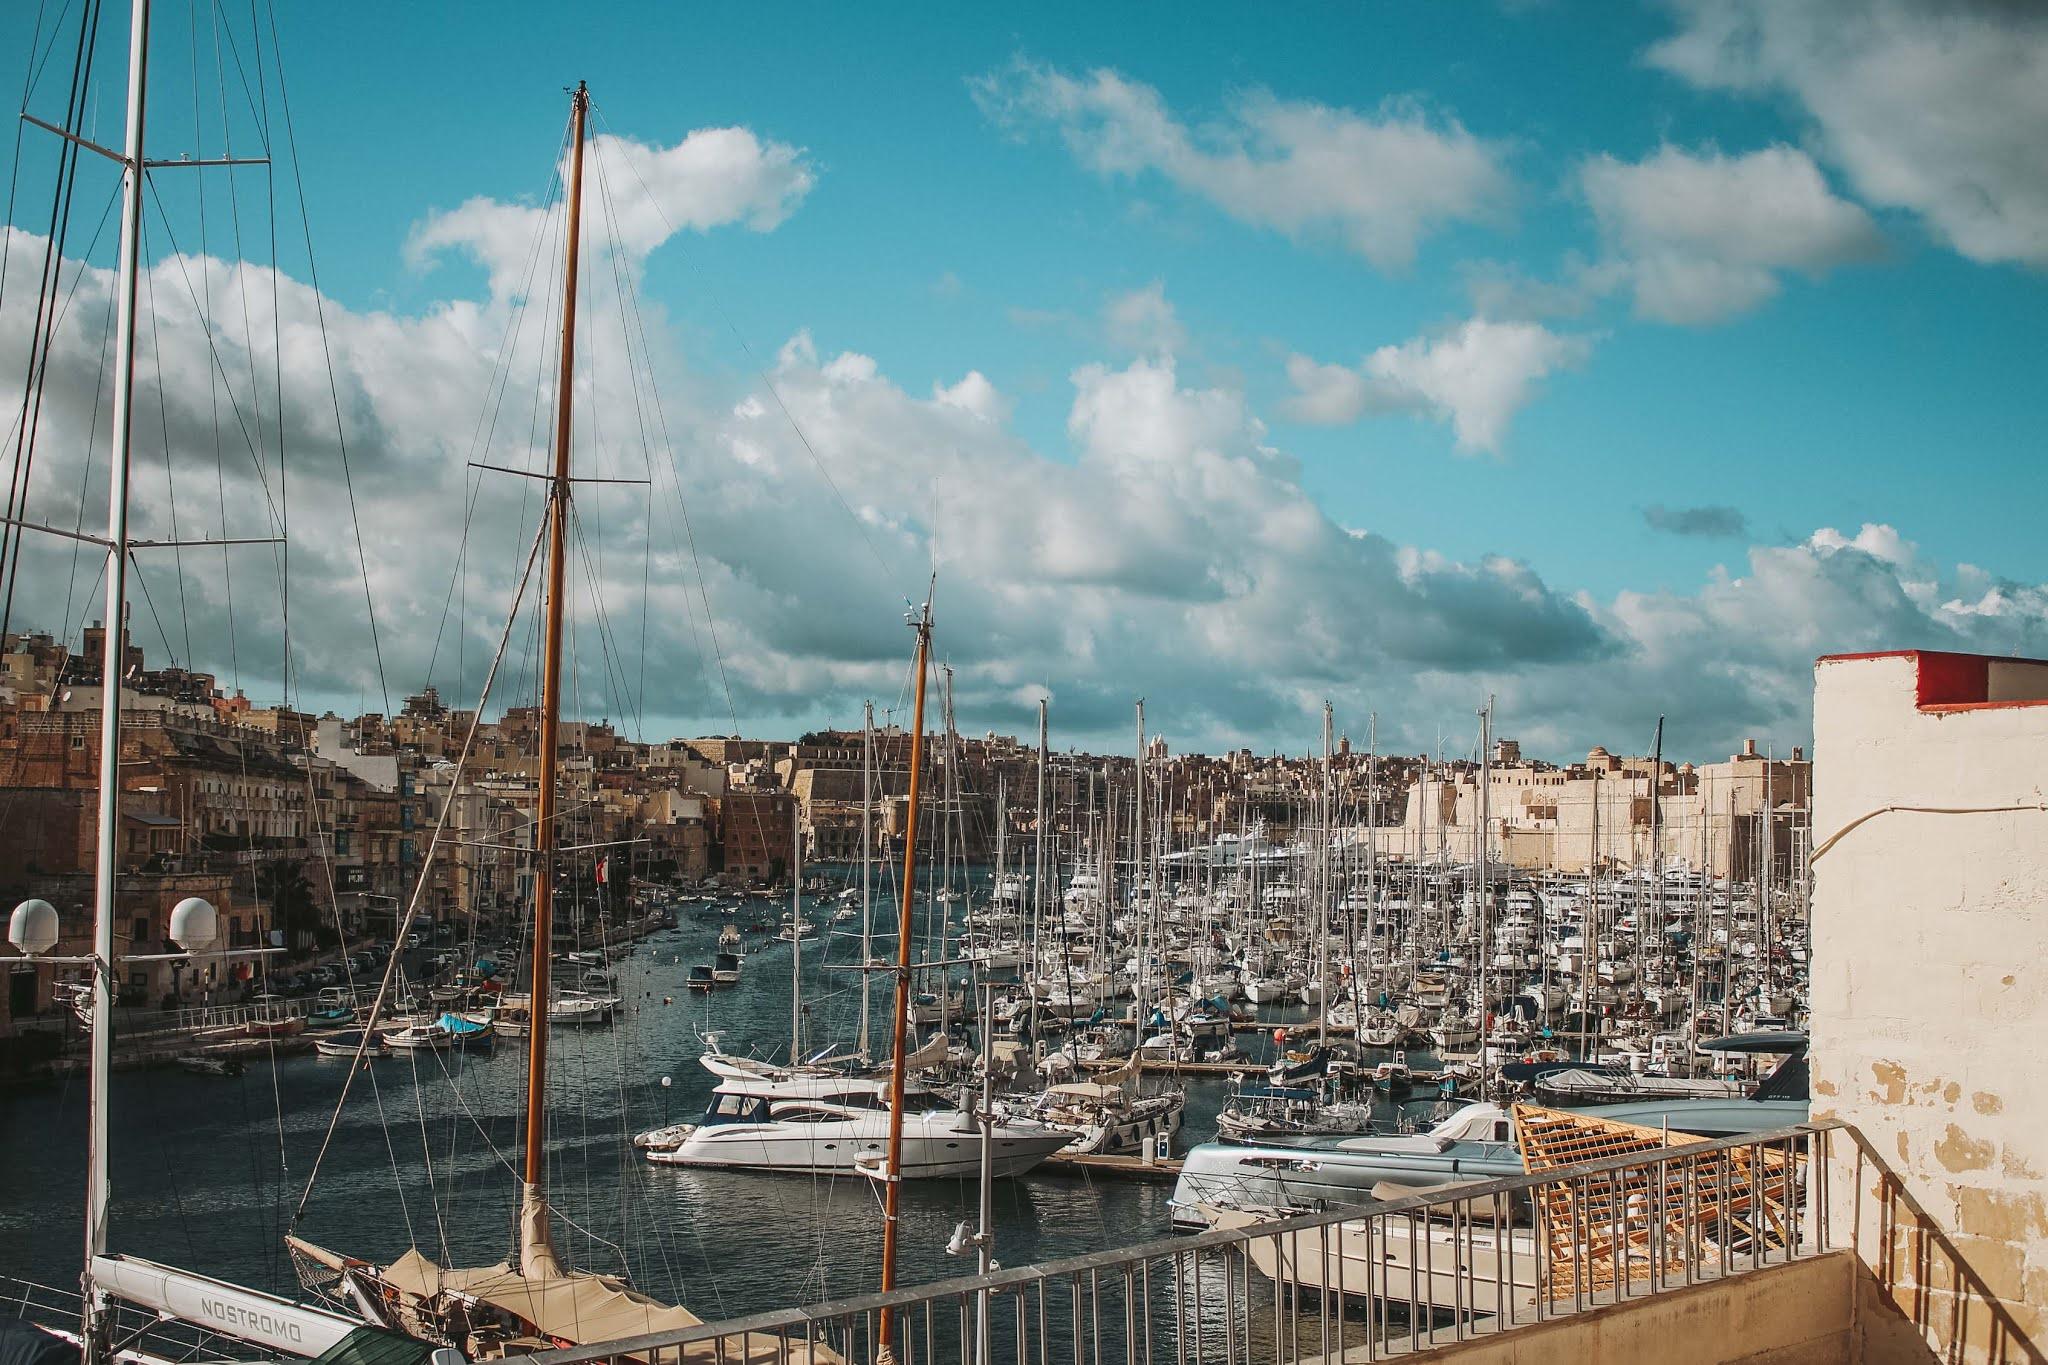 Hafen Three Cities